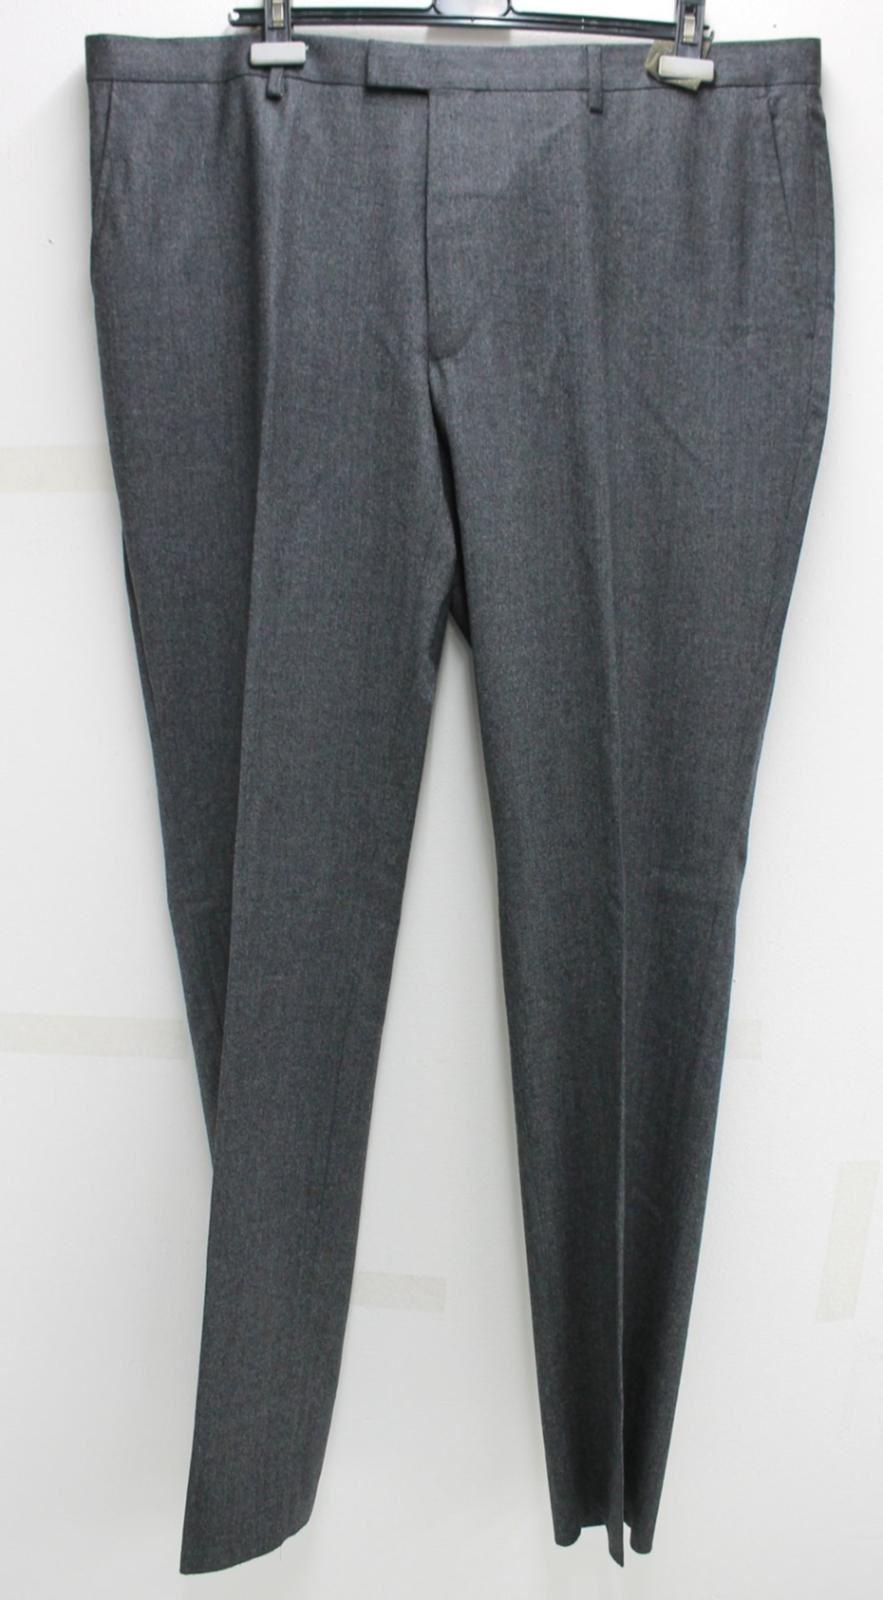 T-M-LEWIN-Mens-Adrian-Grey-Twill-Wool-Slim-Fit-Wool-Suit-Trousers-42R-BNWT